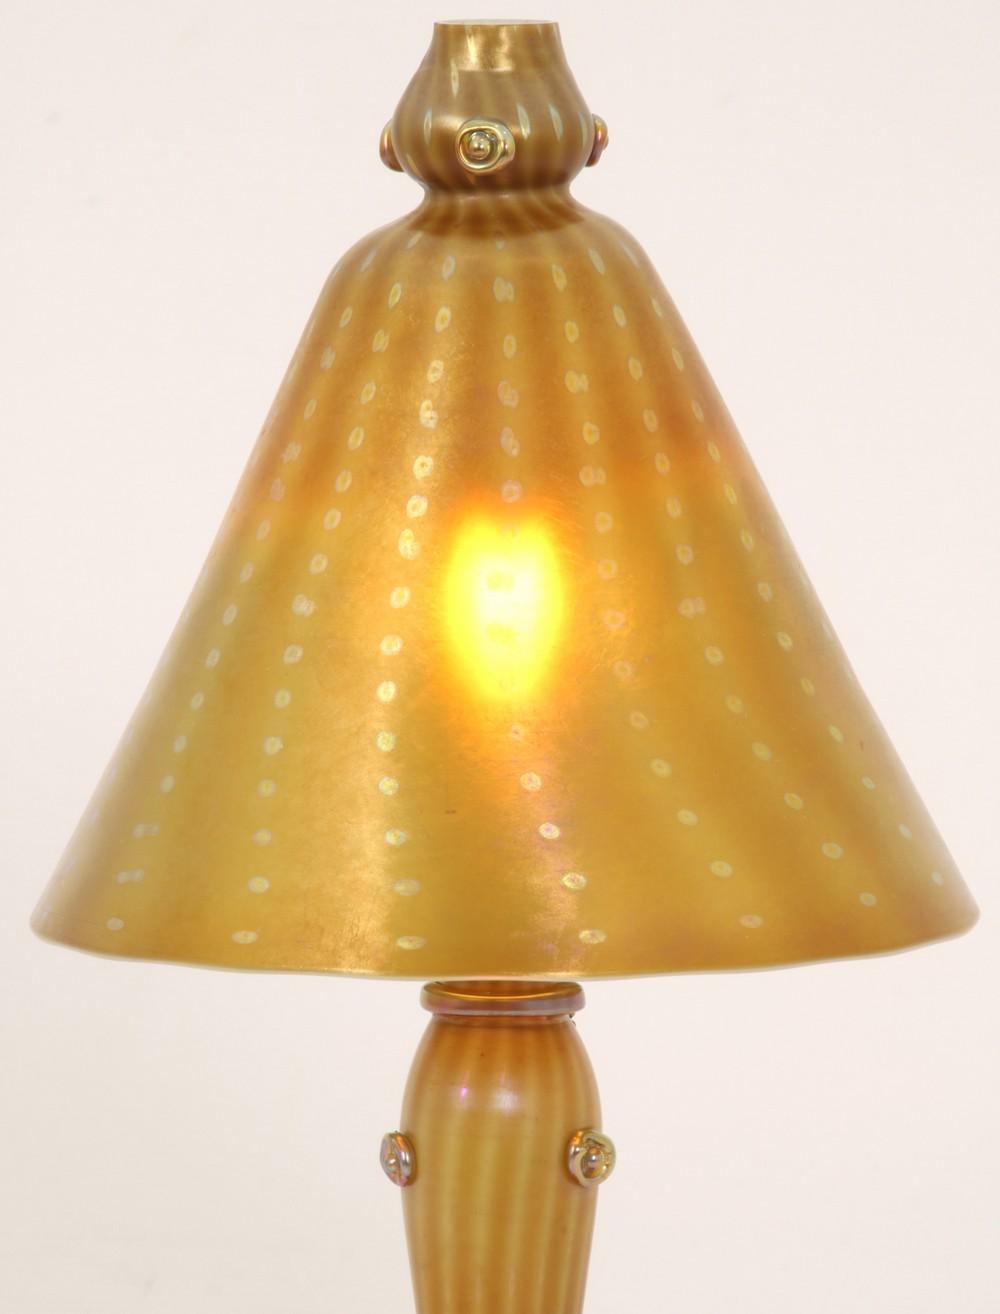 Tiffany Studios Arabian Boudoir Lamp